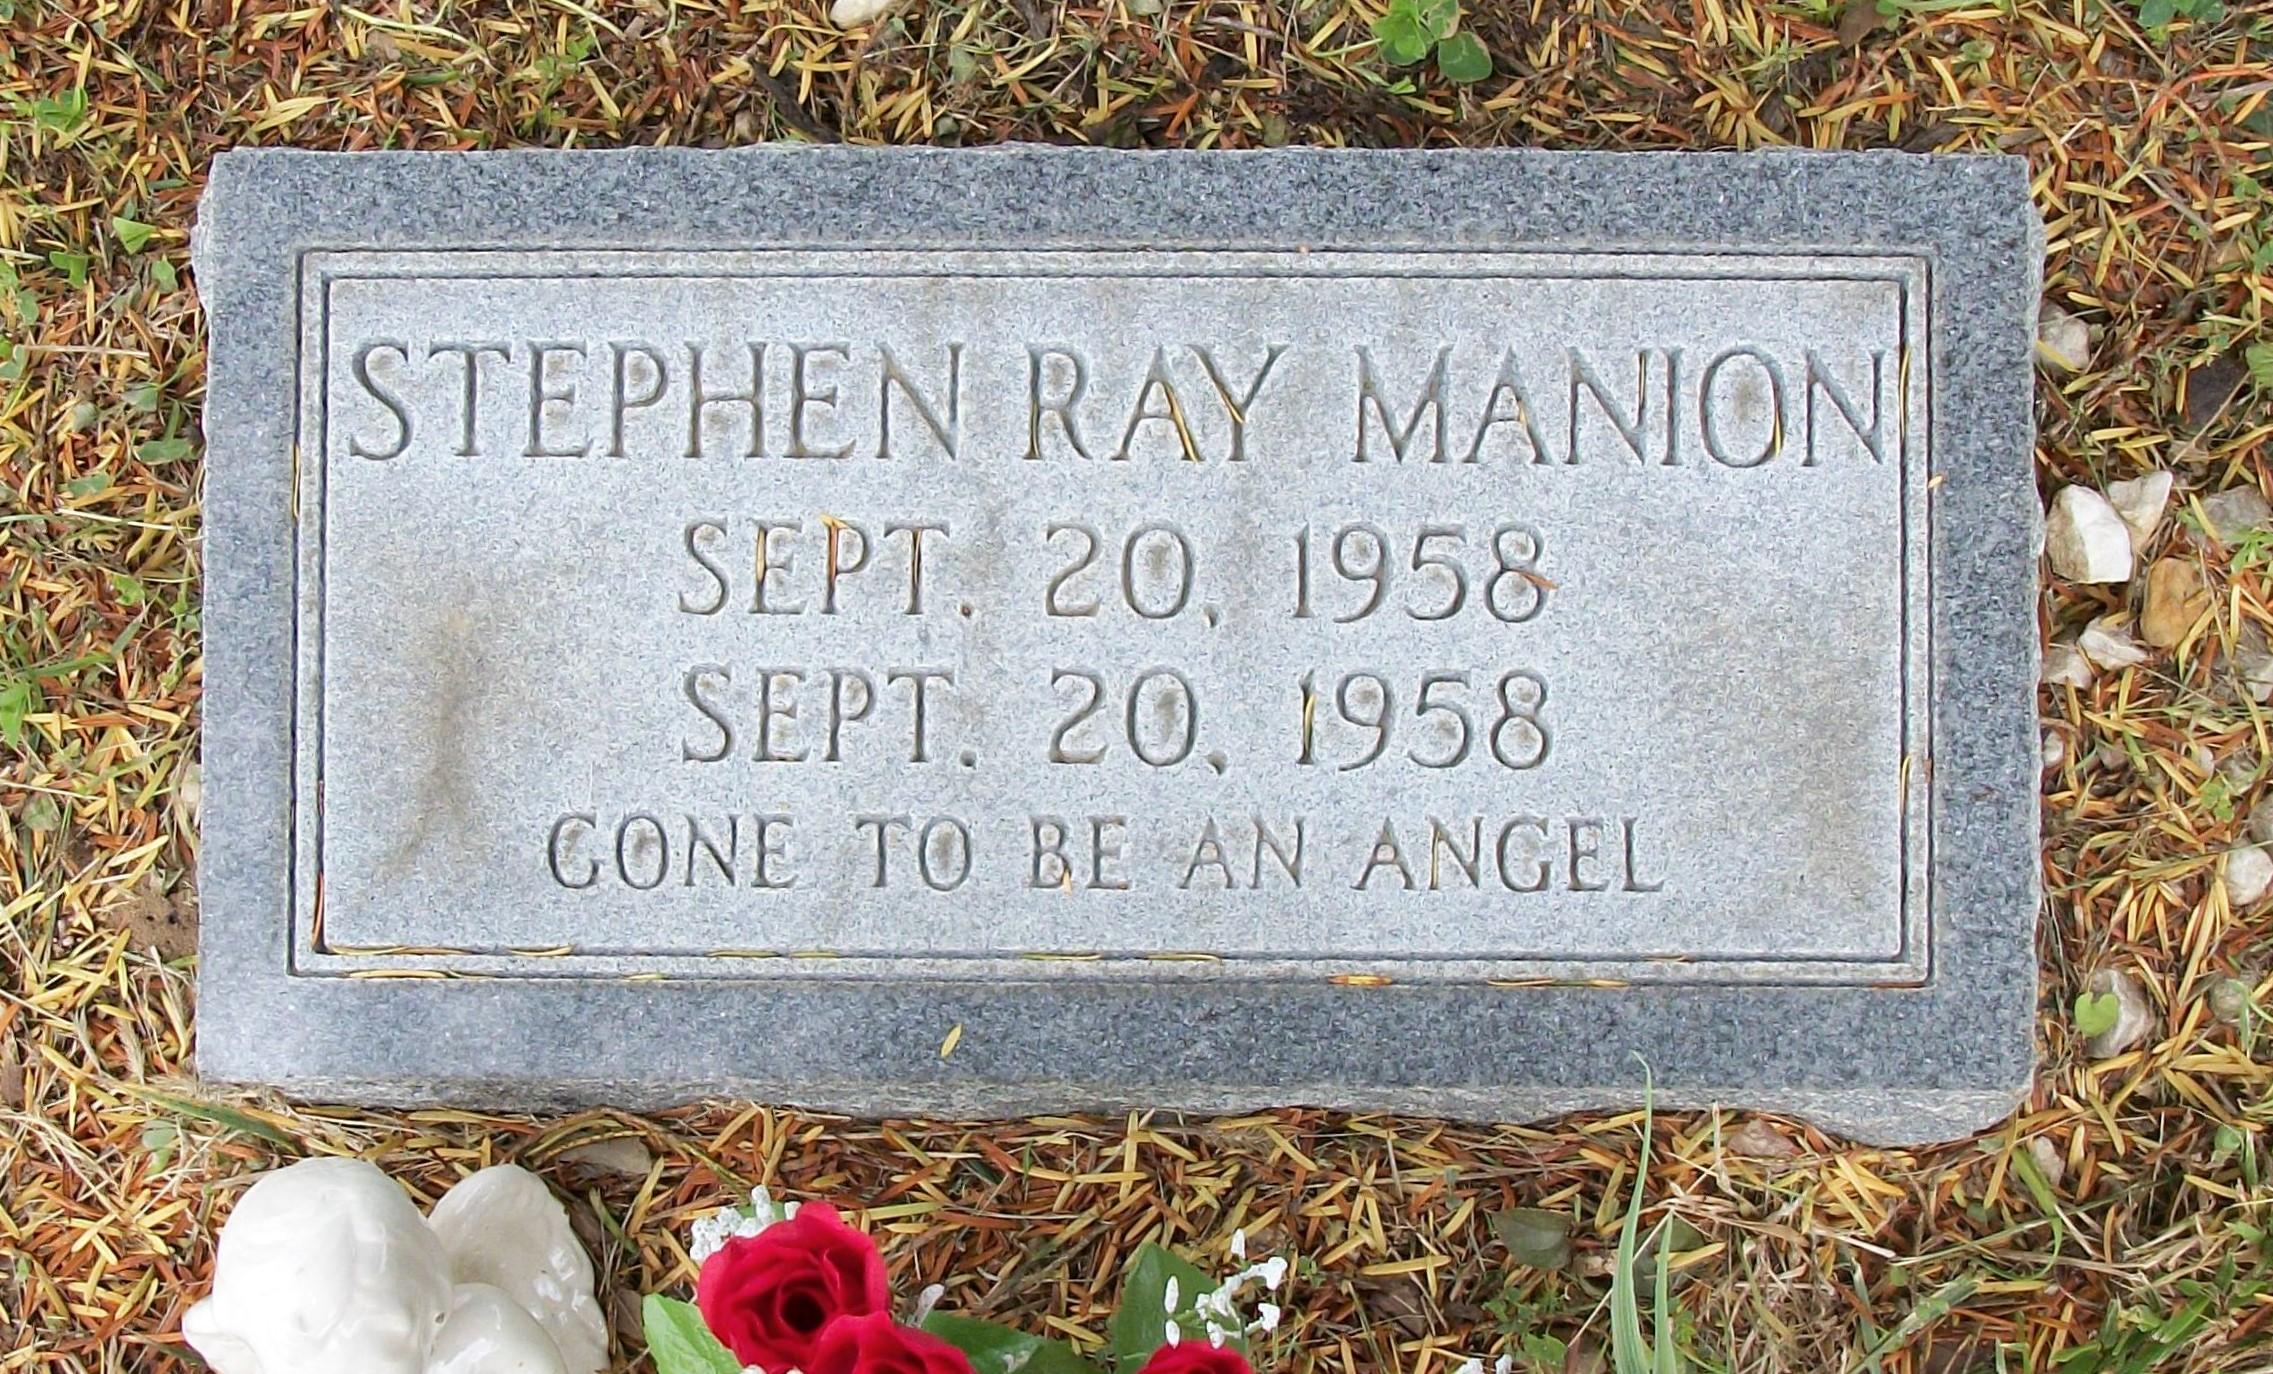 Stephen Ray Manion